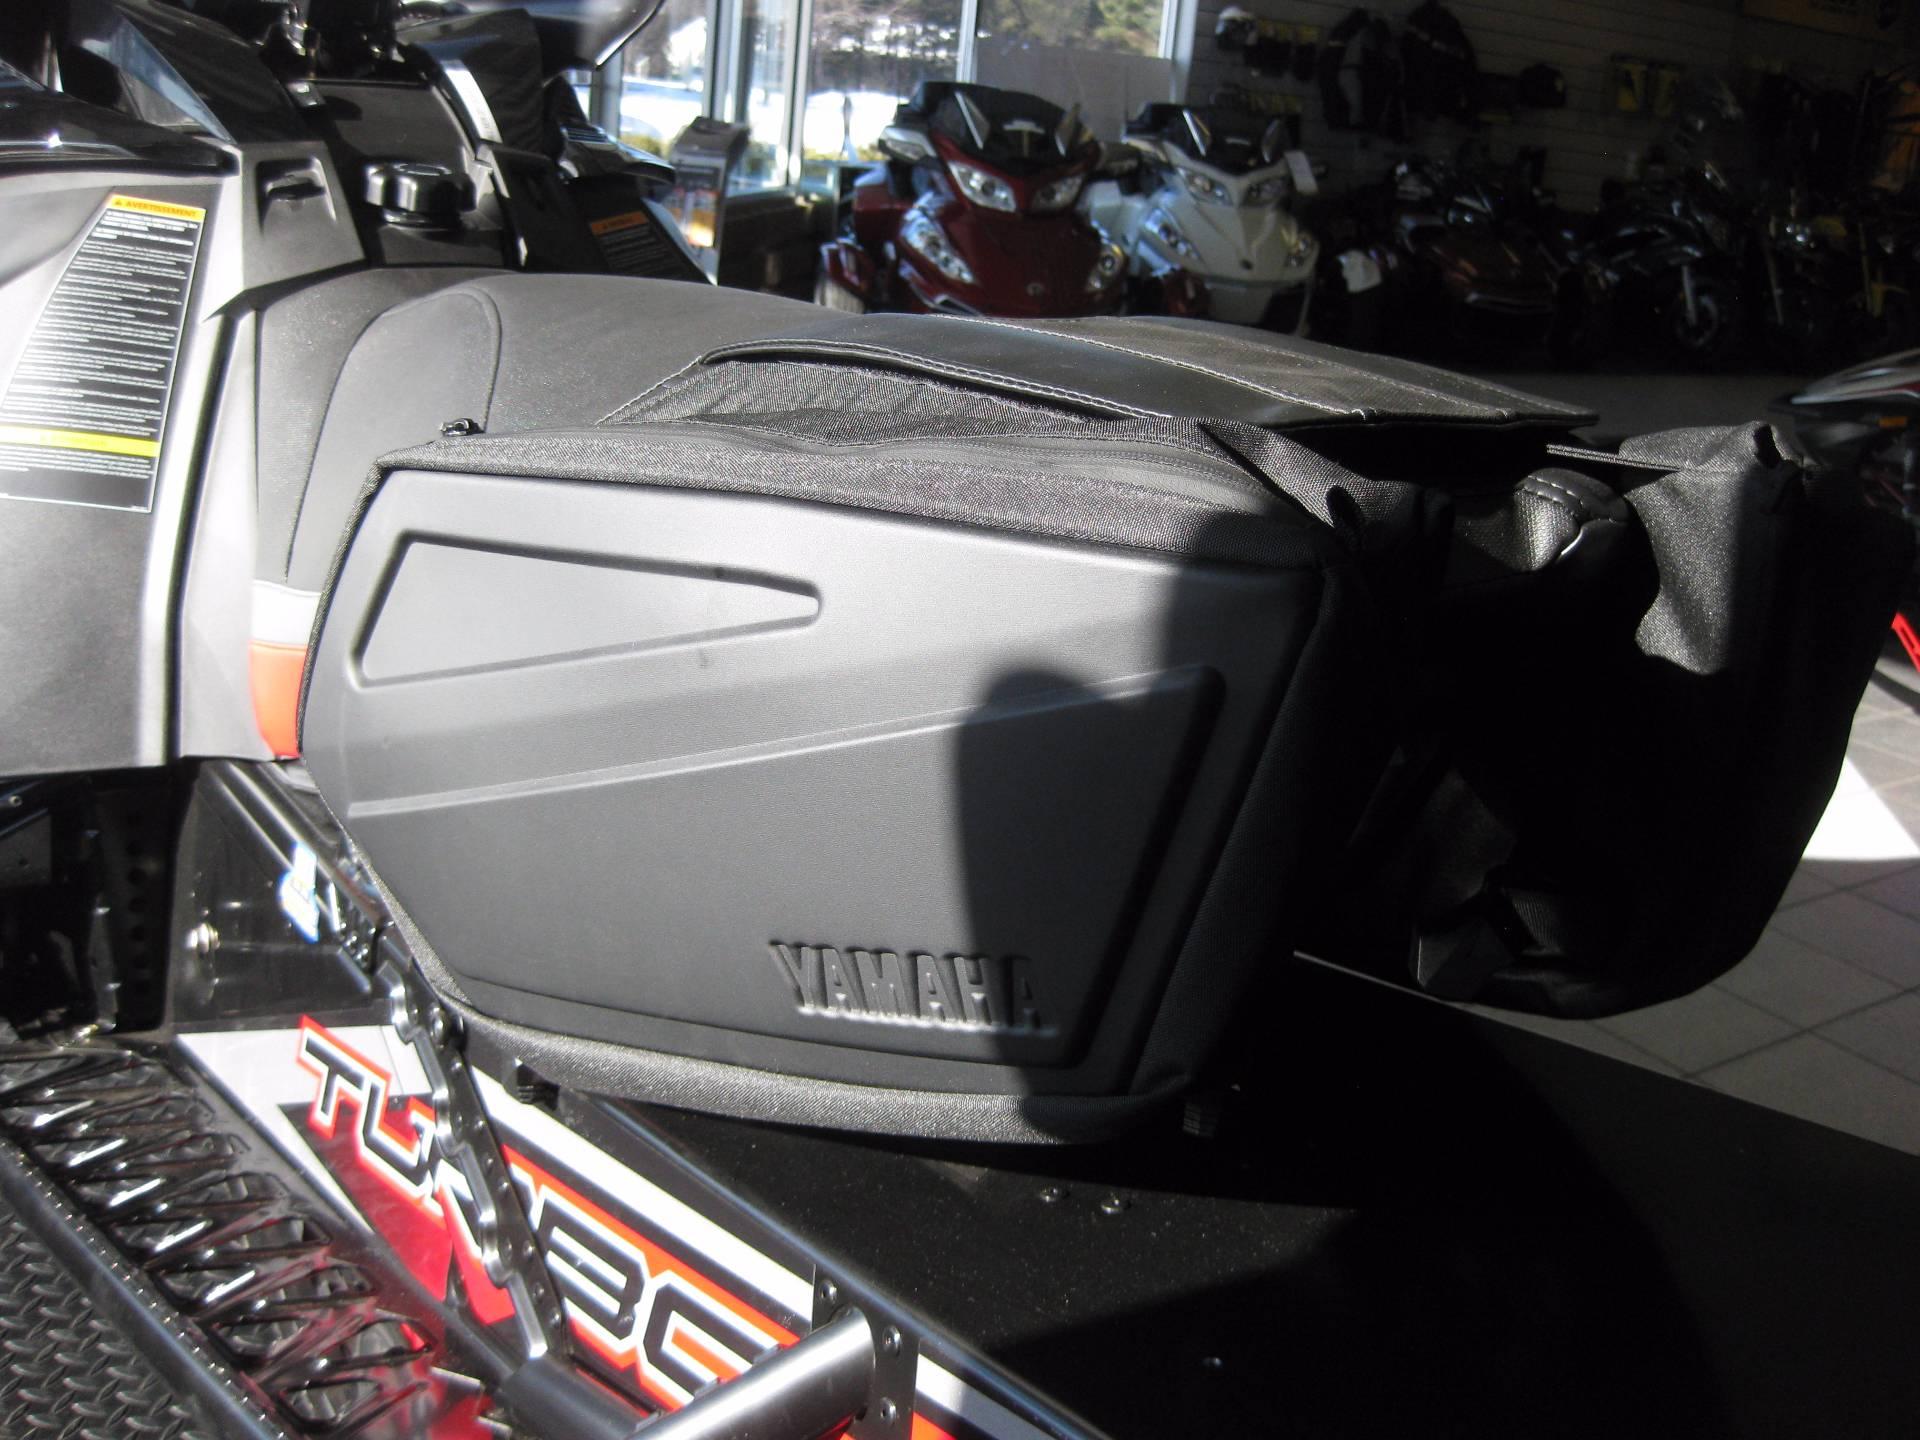 2017 Yamaha Sidewinder S-TX DX in Wisconsin Rapids, Wisconsin